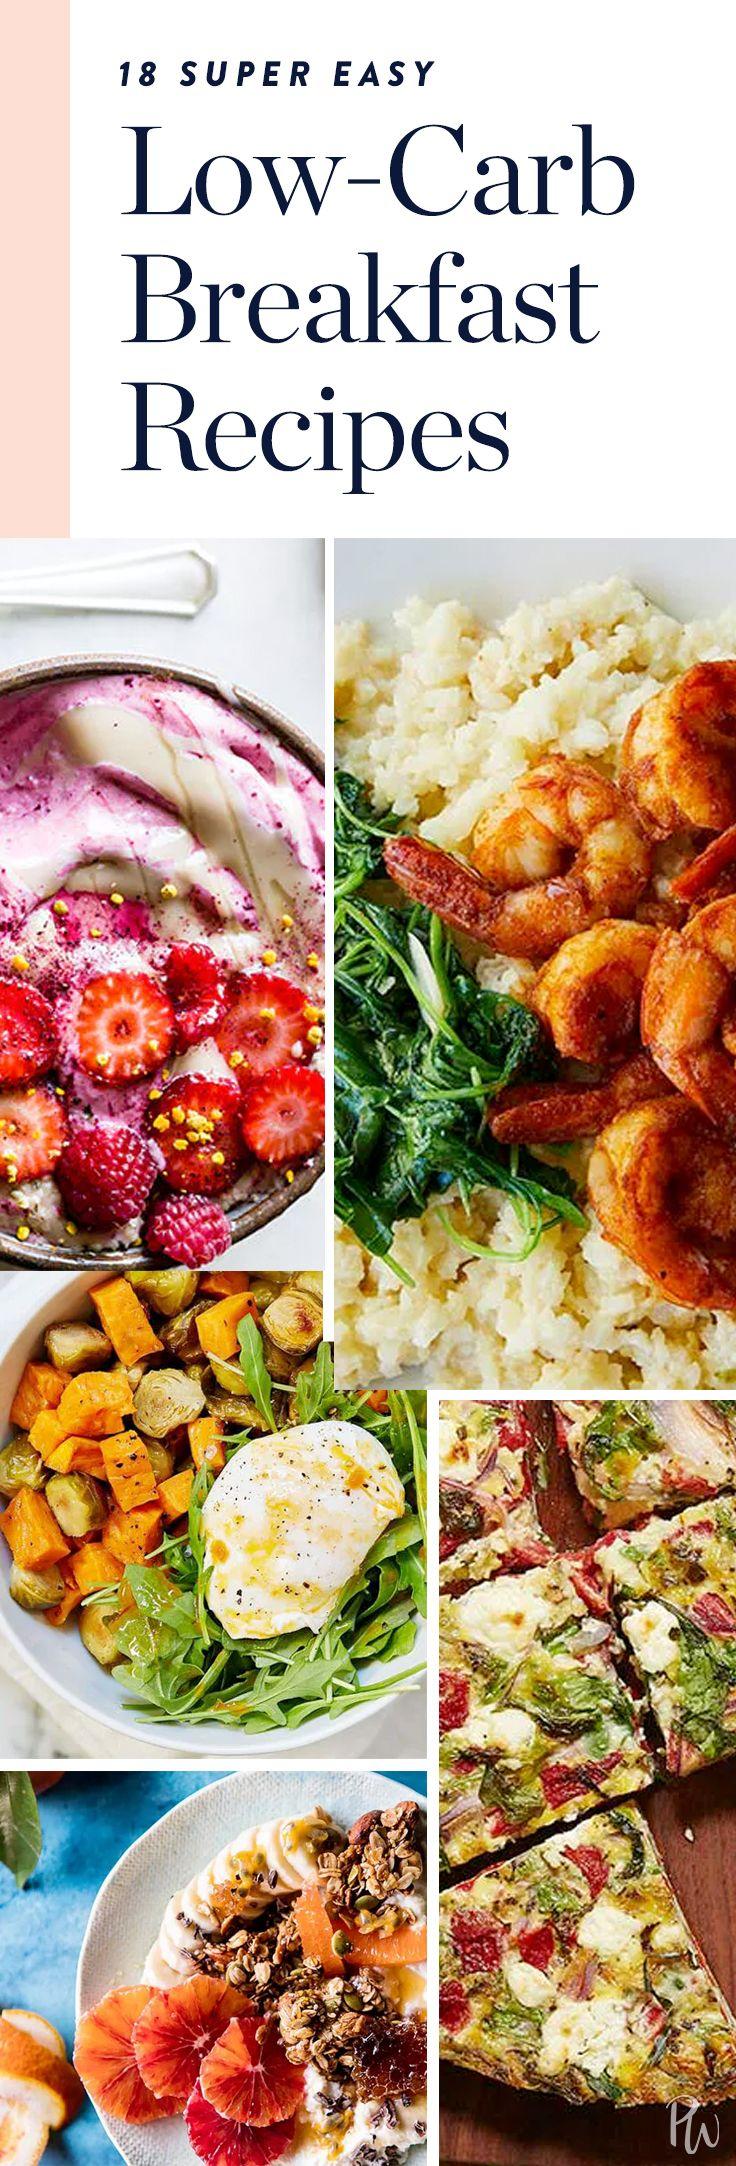 18 Ridiculously Easy Low-Carb Breakfast Recipes  via @PureWow via @PureWow